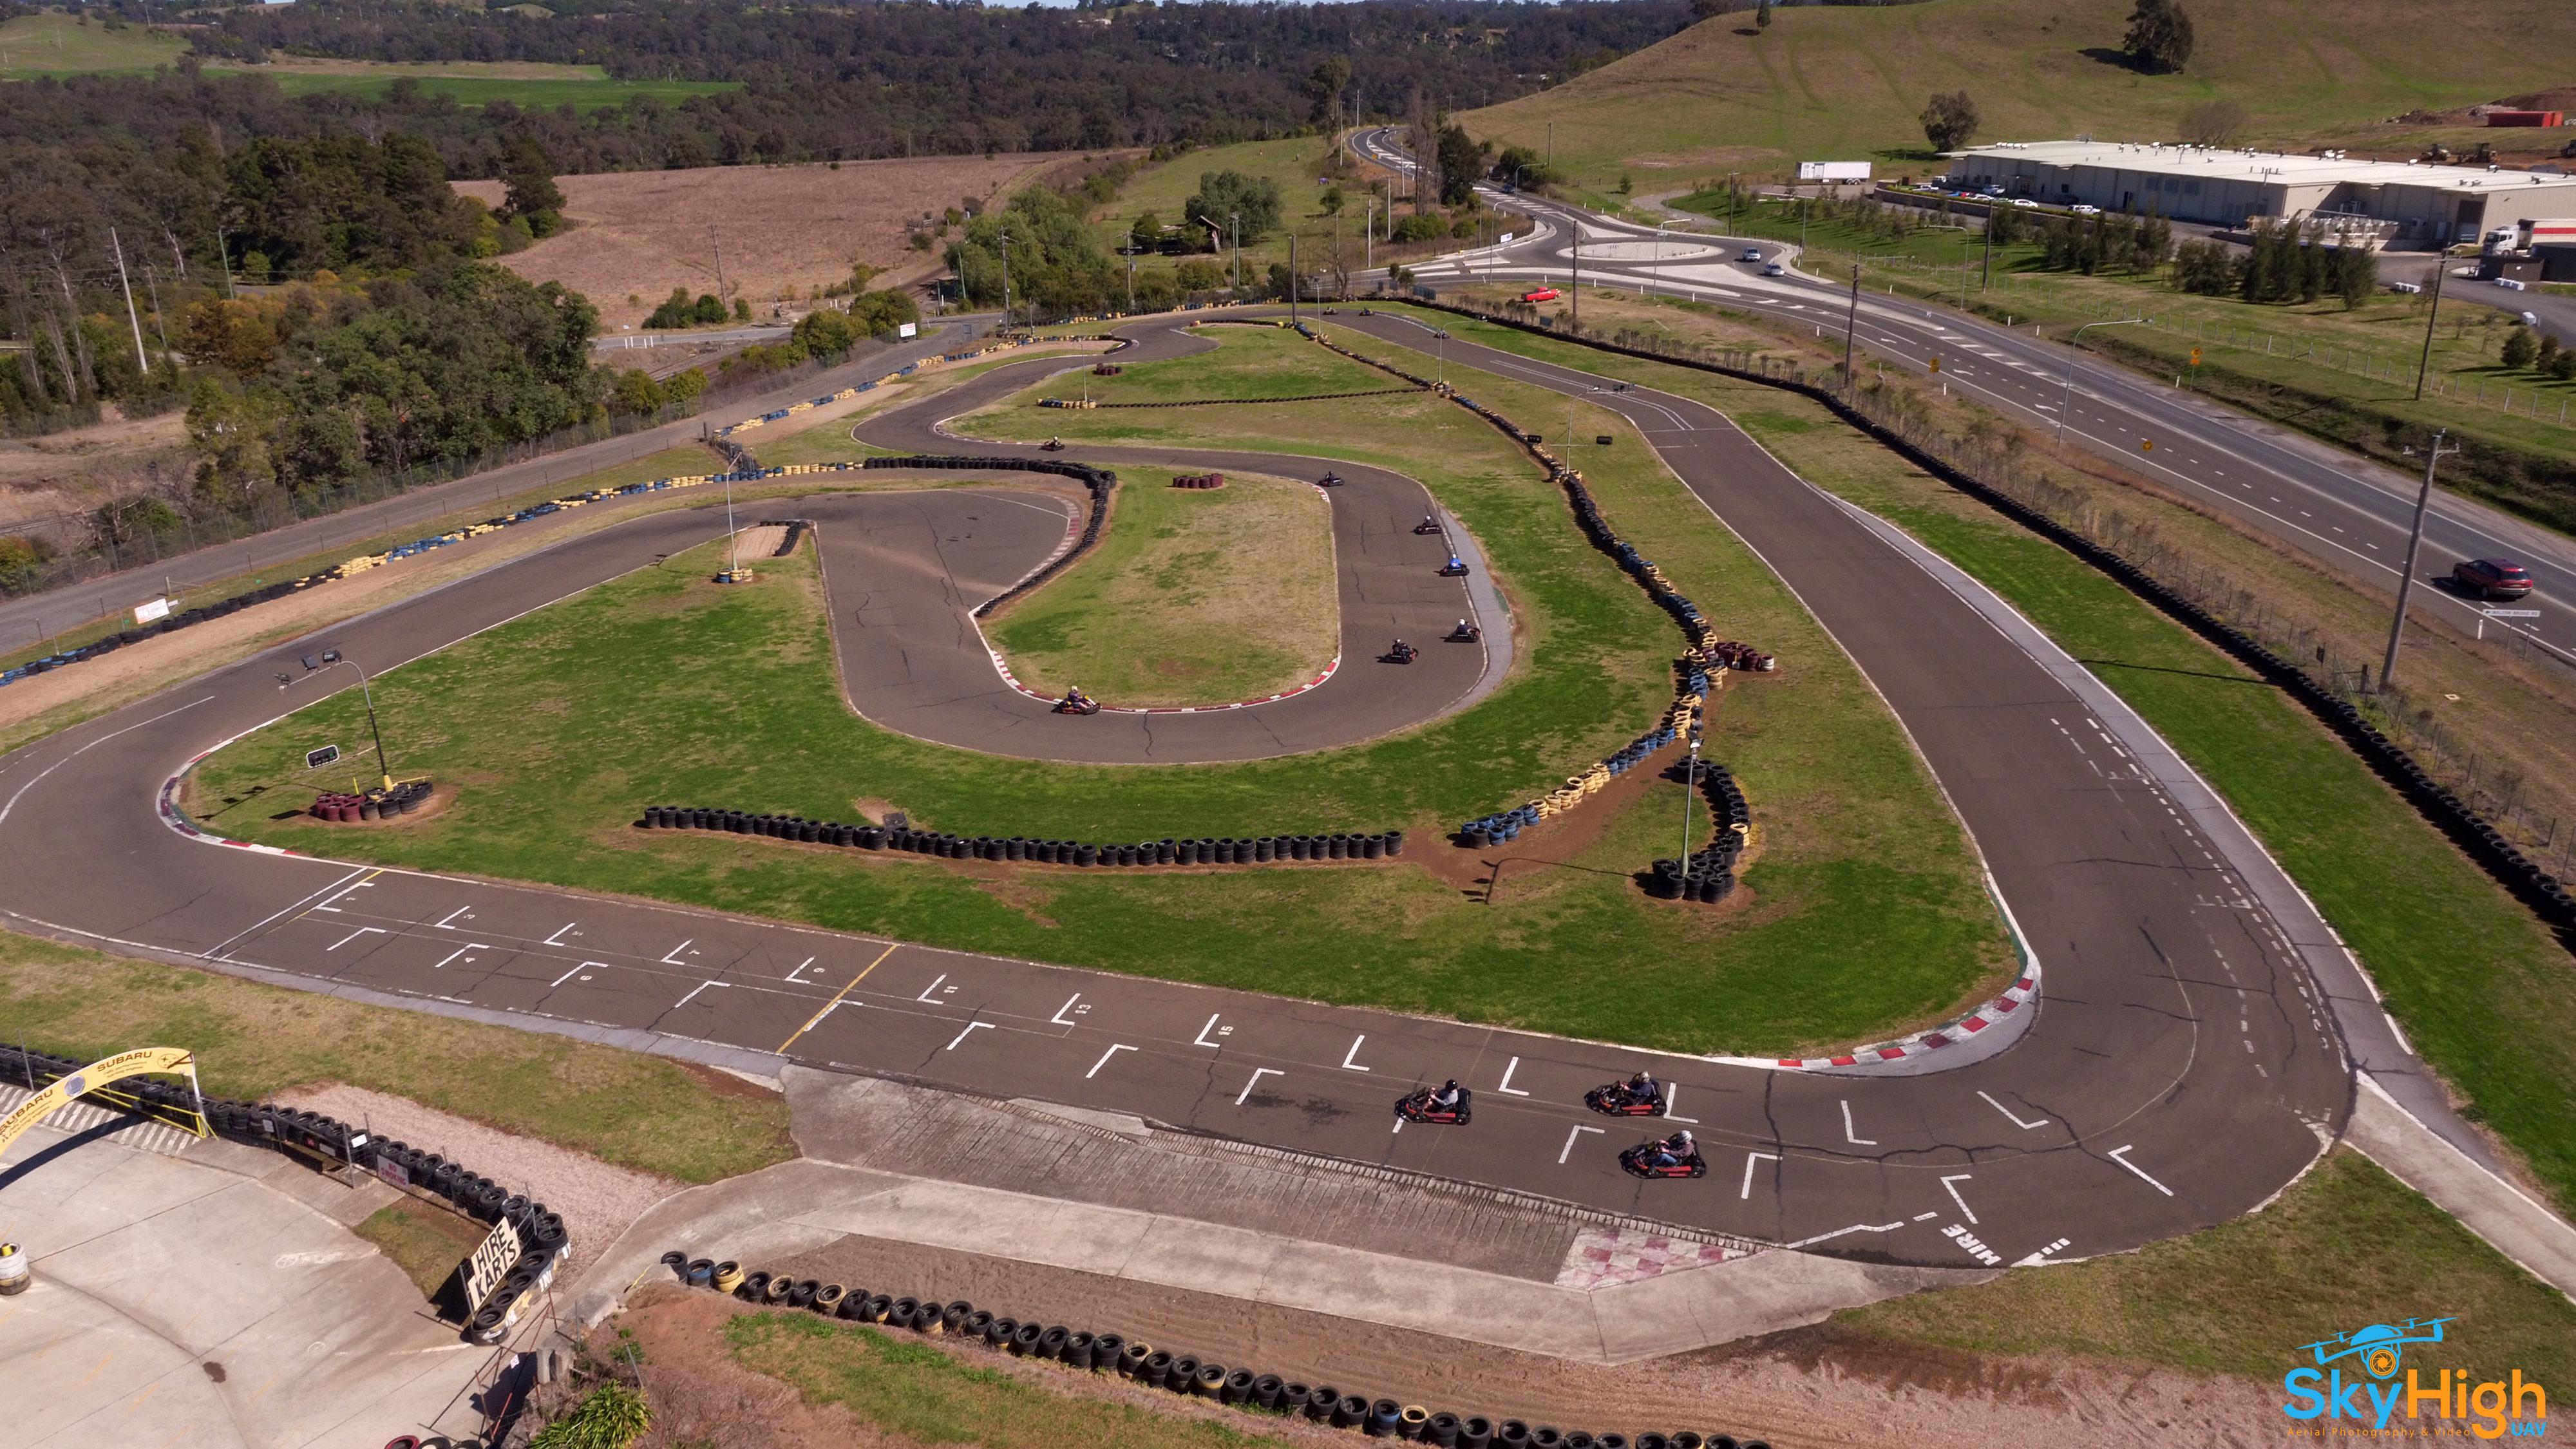 Junior Outdoor Karting, Picton - 3 x 10 Minute Intervals